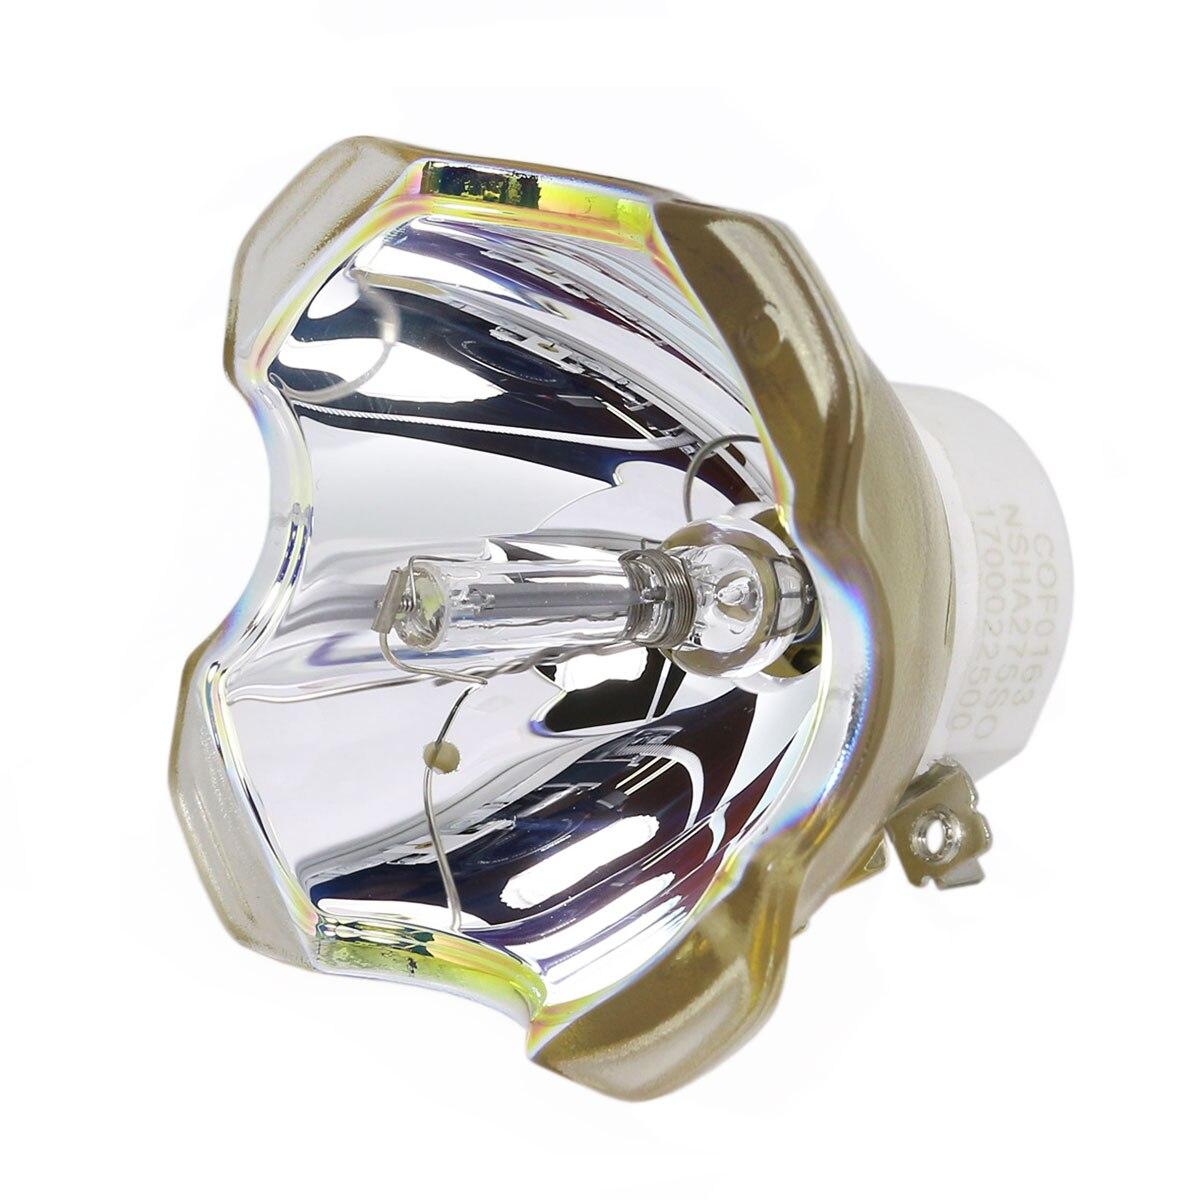 Compatible ET-LAV200 ETLAV200 for Panasonic PT-VW435N PT-VW431D PT-VW440 PT-VX505N PT-VX500 PT-VX510 Projector Lamp Bulb Without<br>